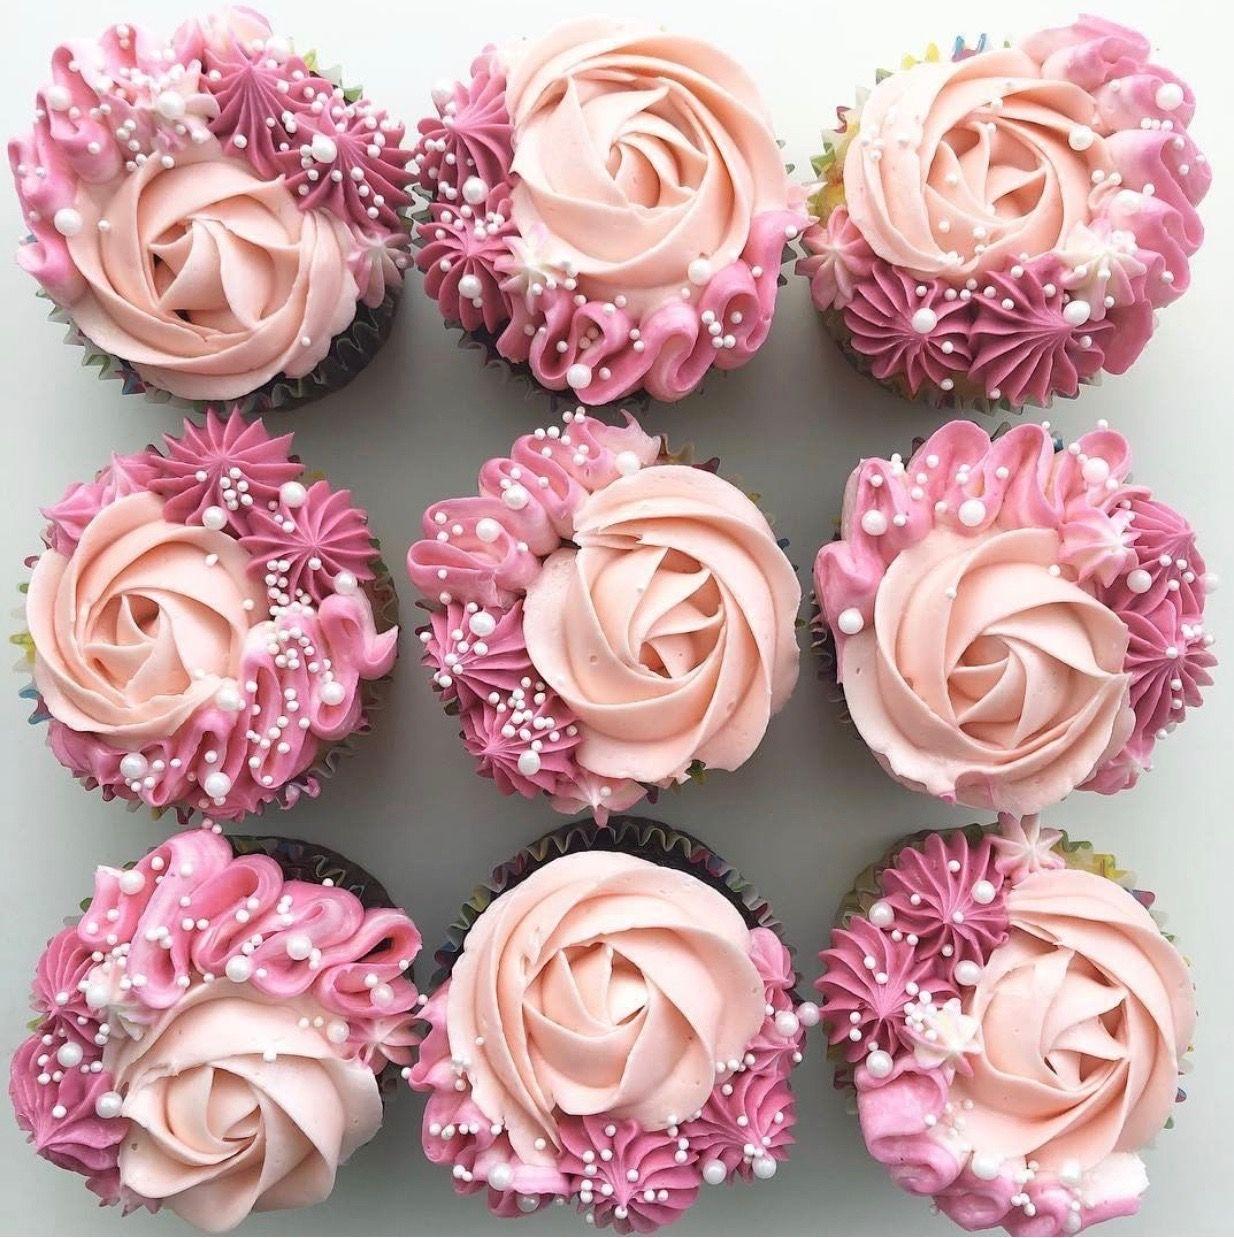 Wedding Cupcake Decorating Ideas: Pink Buttercream Cupcakes